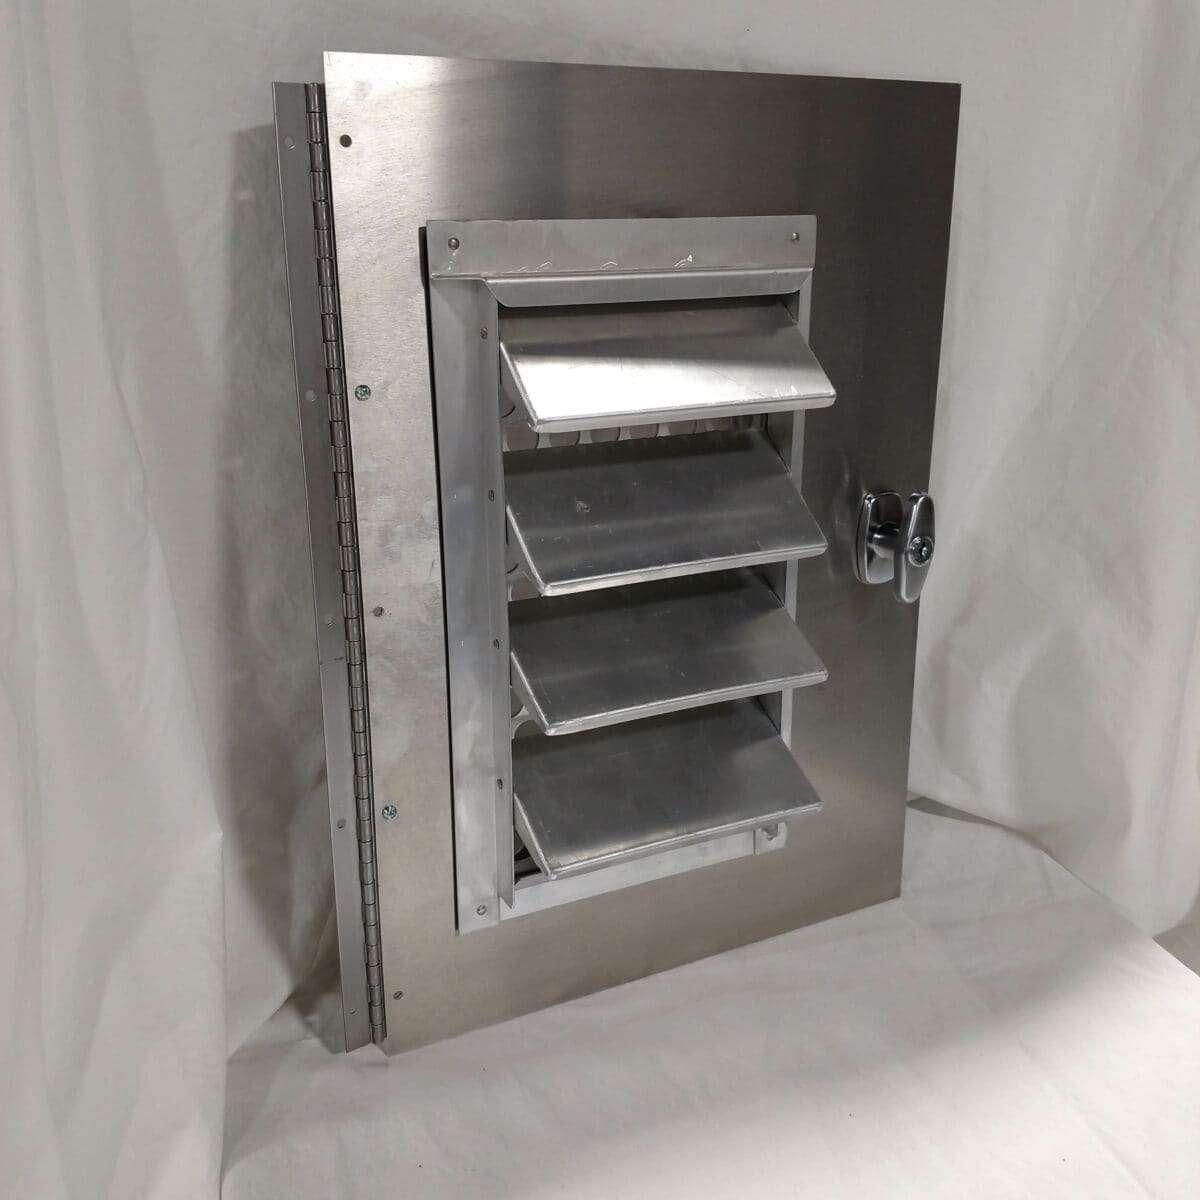 Assembled Smooth Alum Door Kit Size 14 75 X 21 W 9 4